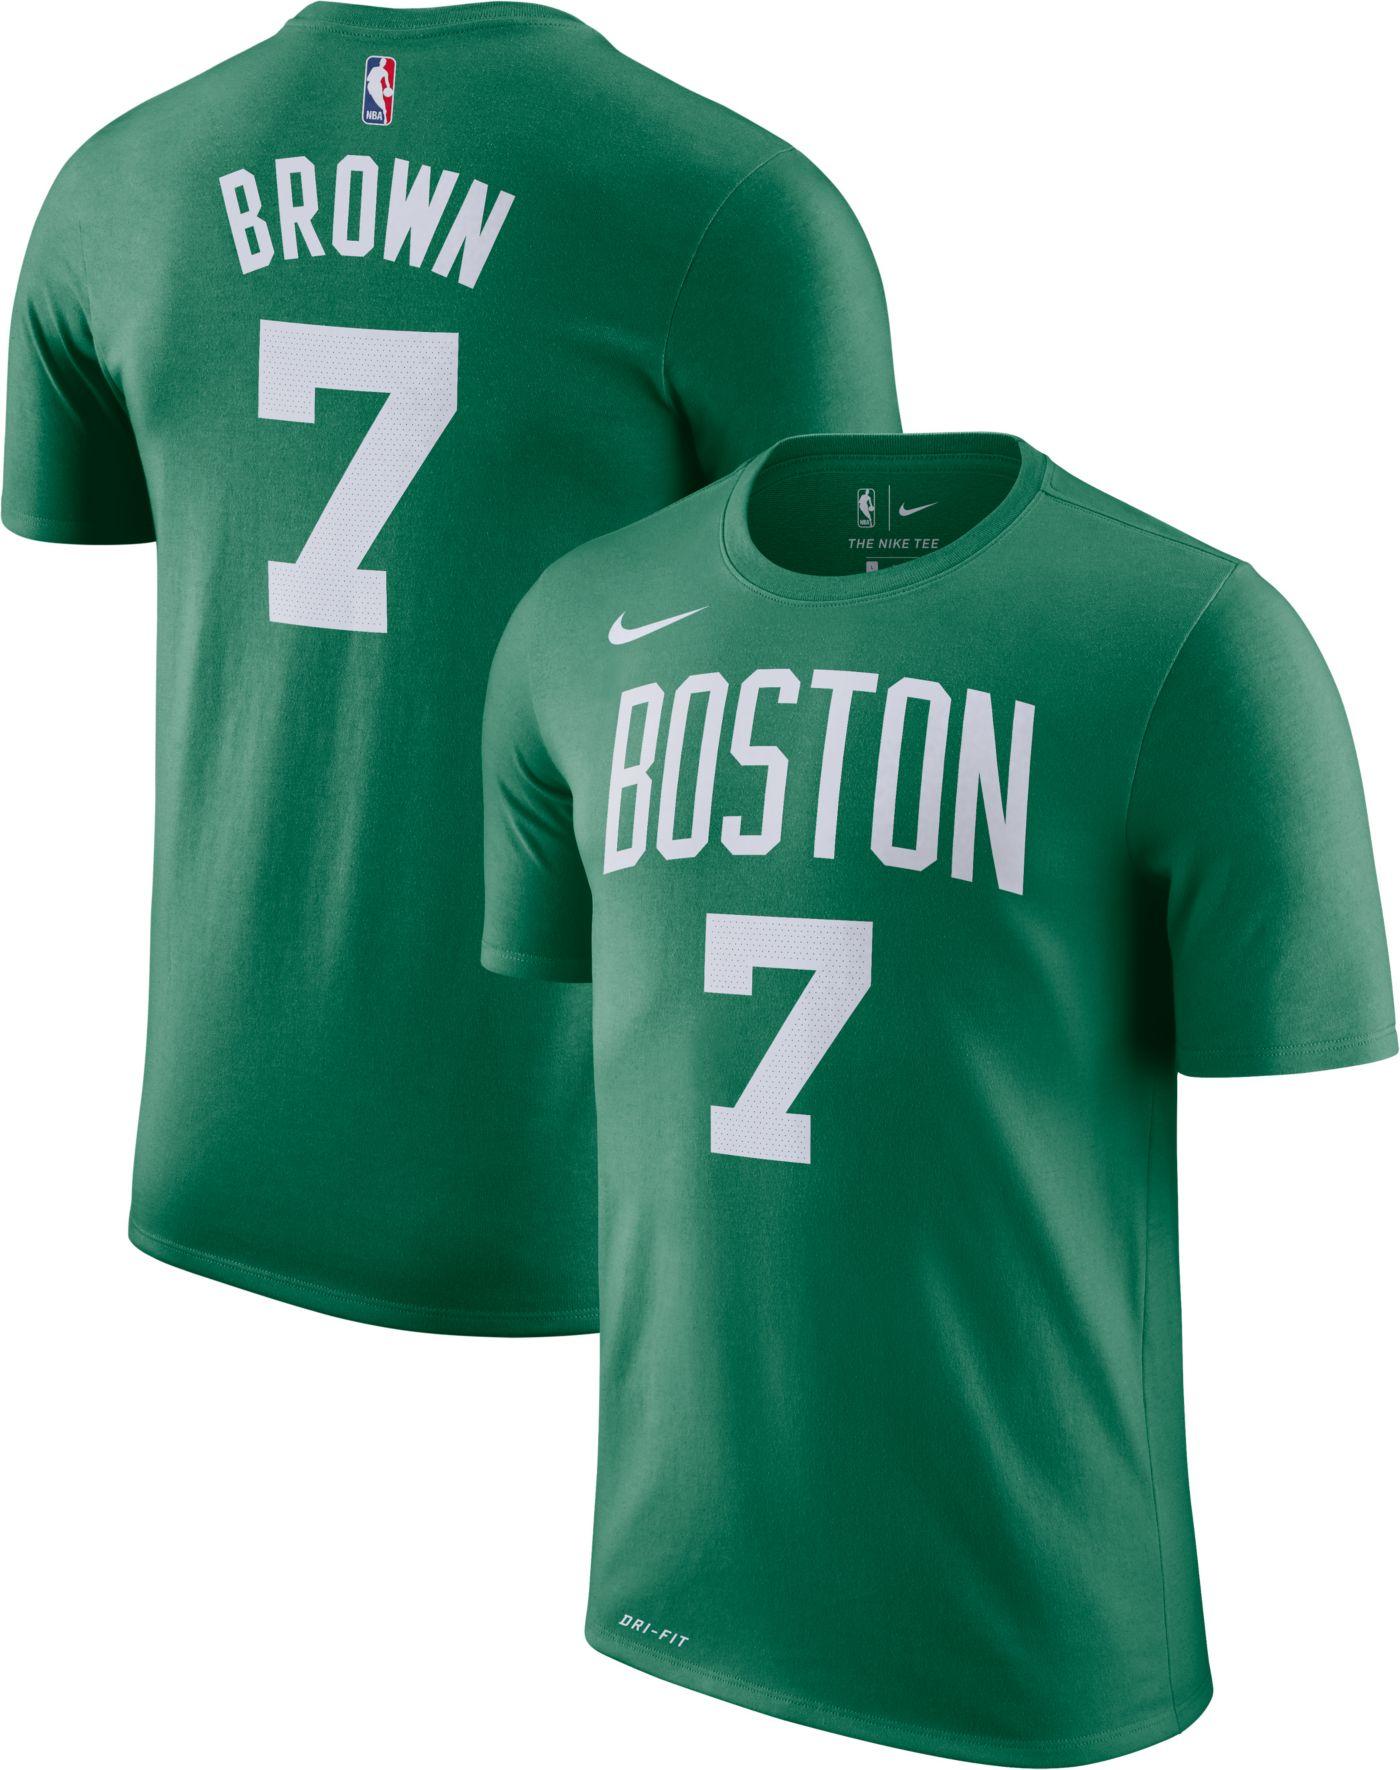 Nike Youth Boston Celtics Jaylen Brown #7 Dri-FIT Kelly Green T-Shirt